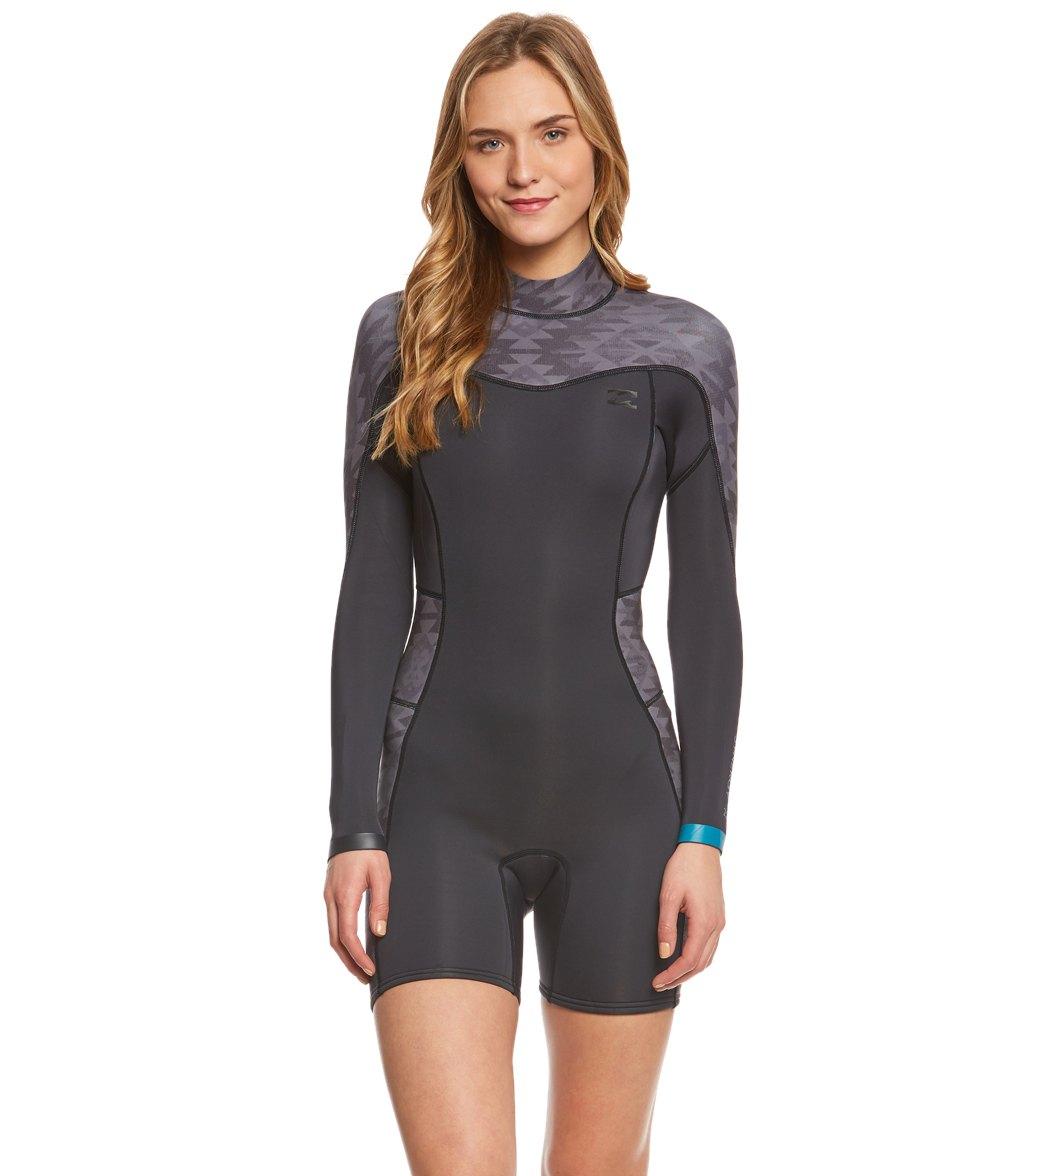 ... Billabong Women s 2mm Synergy Back Zip Long Sleeve Springsuit Wetsuit  Play Video. MODEL MEASUREMENTS 1102618b7